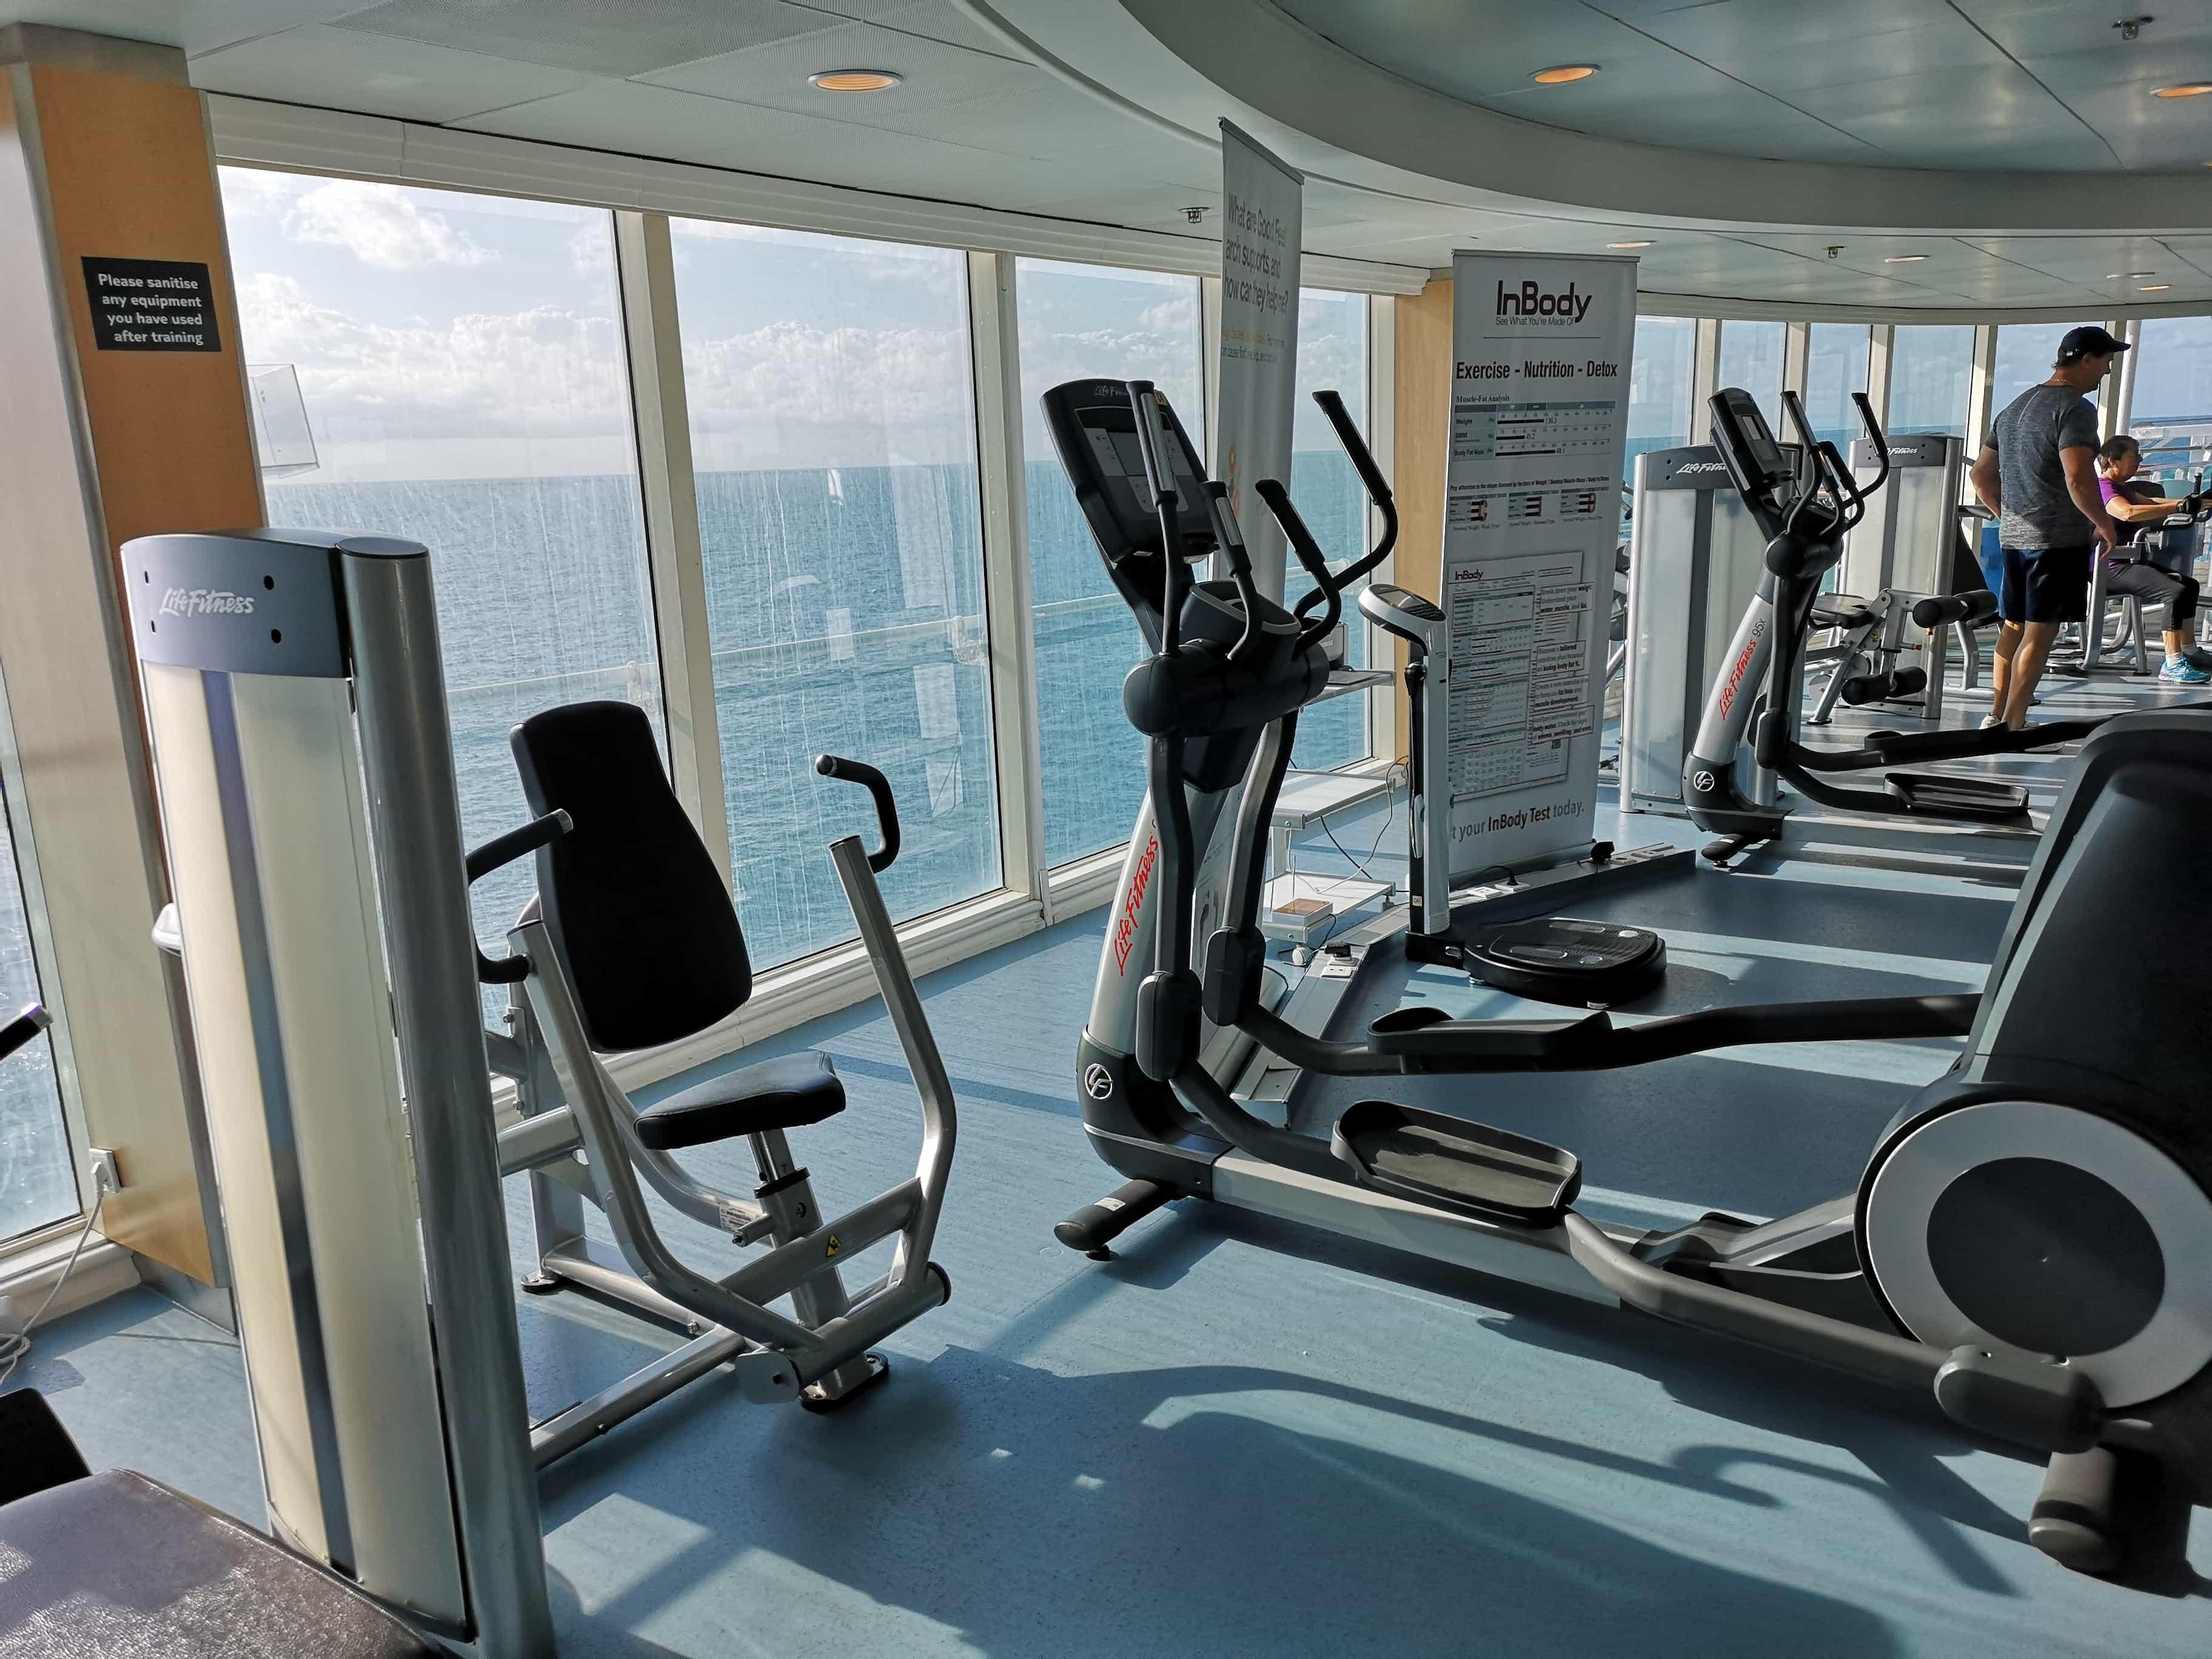 Marella Discovery Gym Machines Free